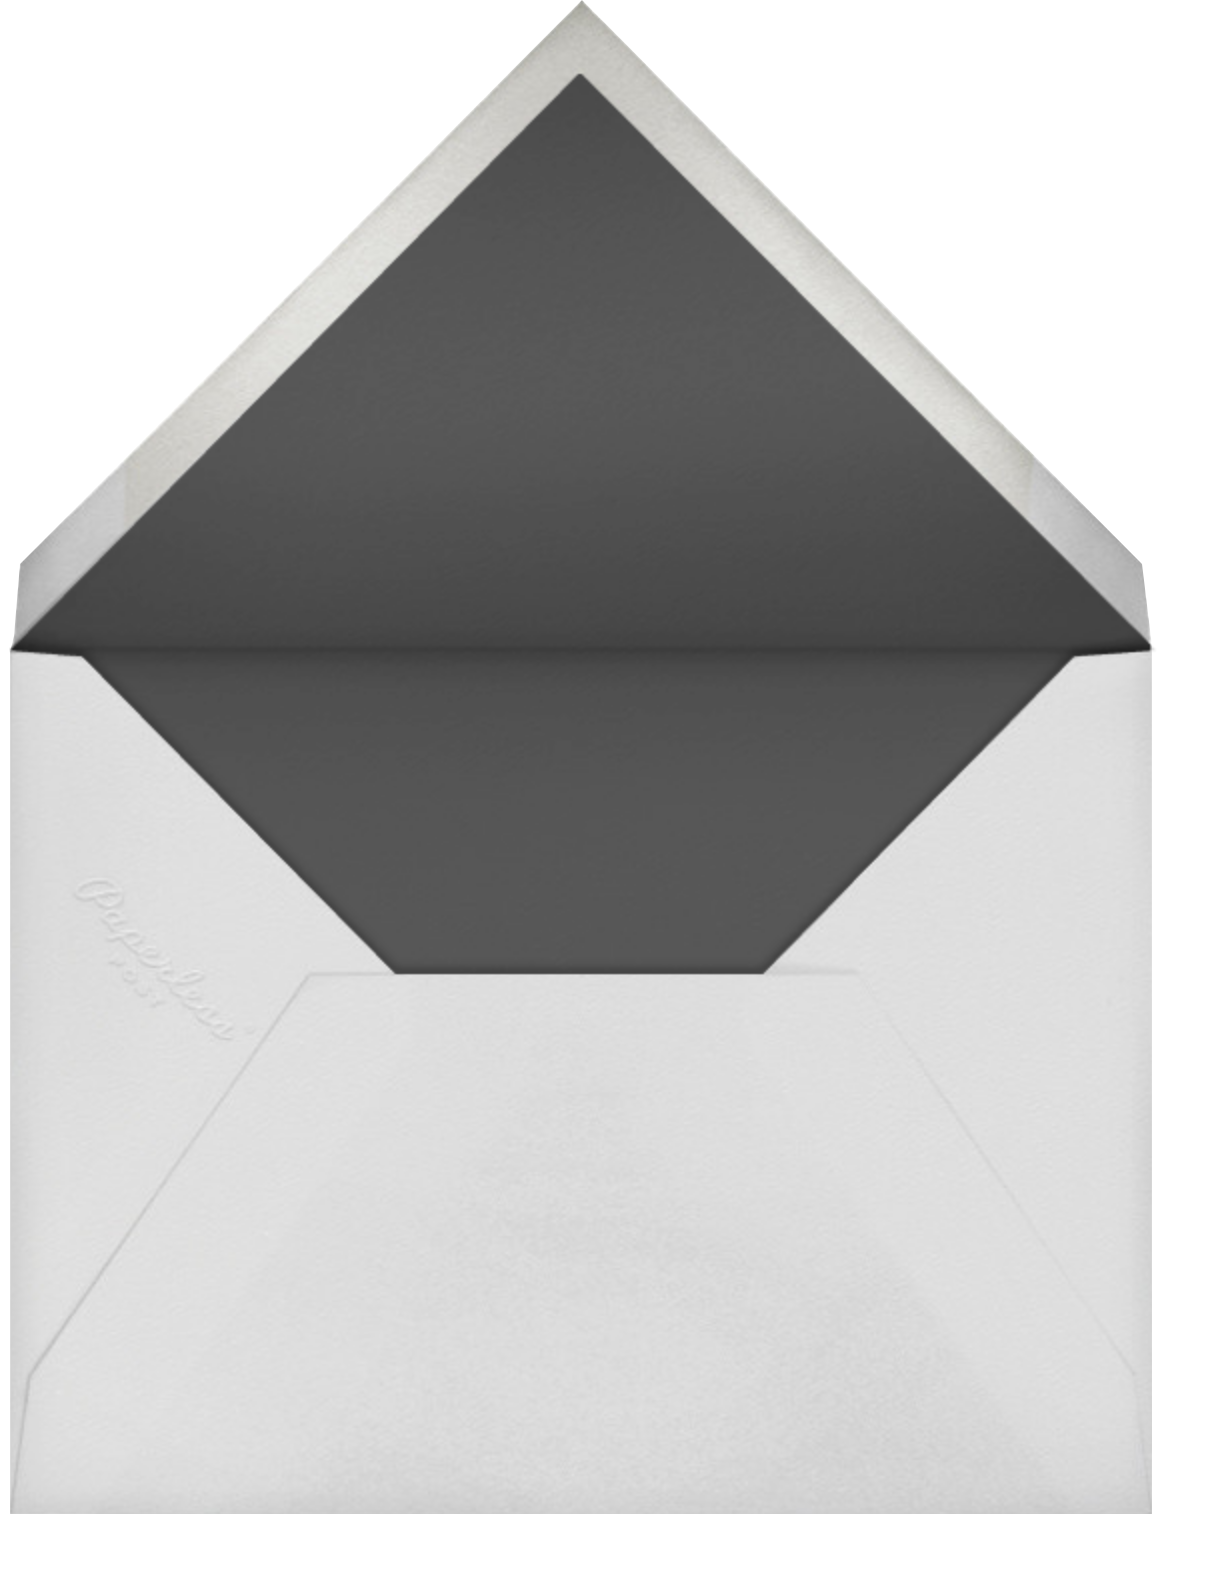 Pacific Palisades - Raspberry - Paperless Post - Envelope